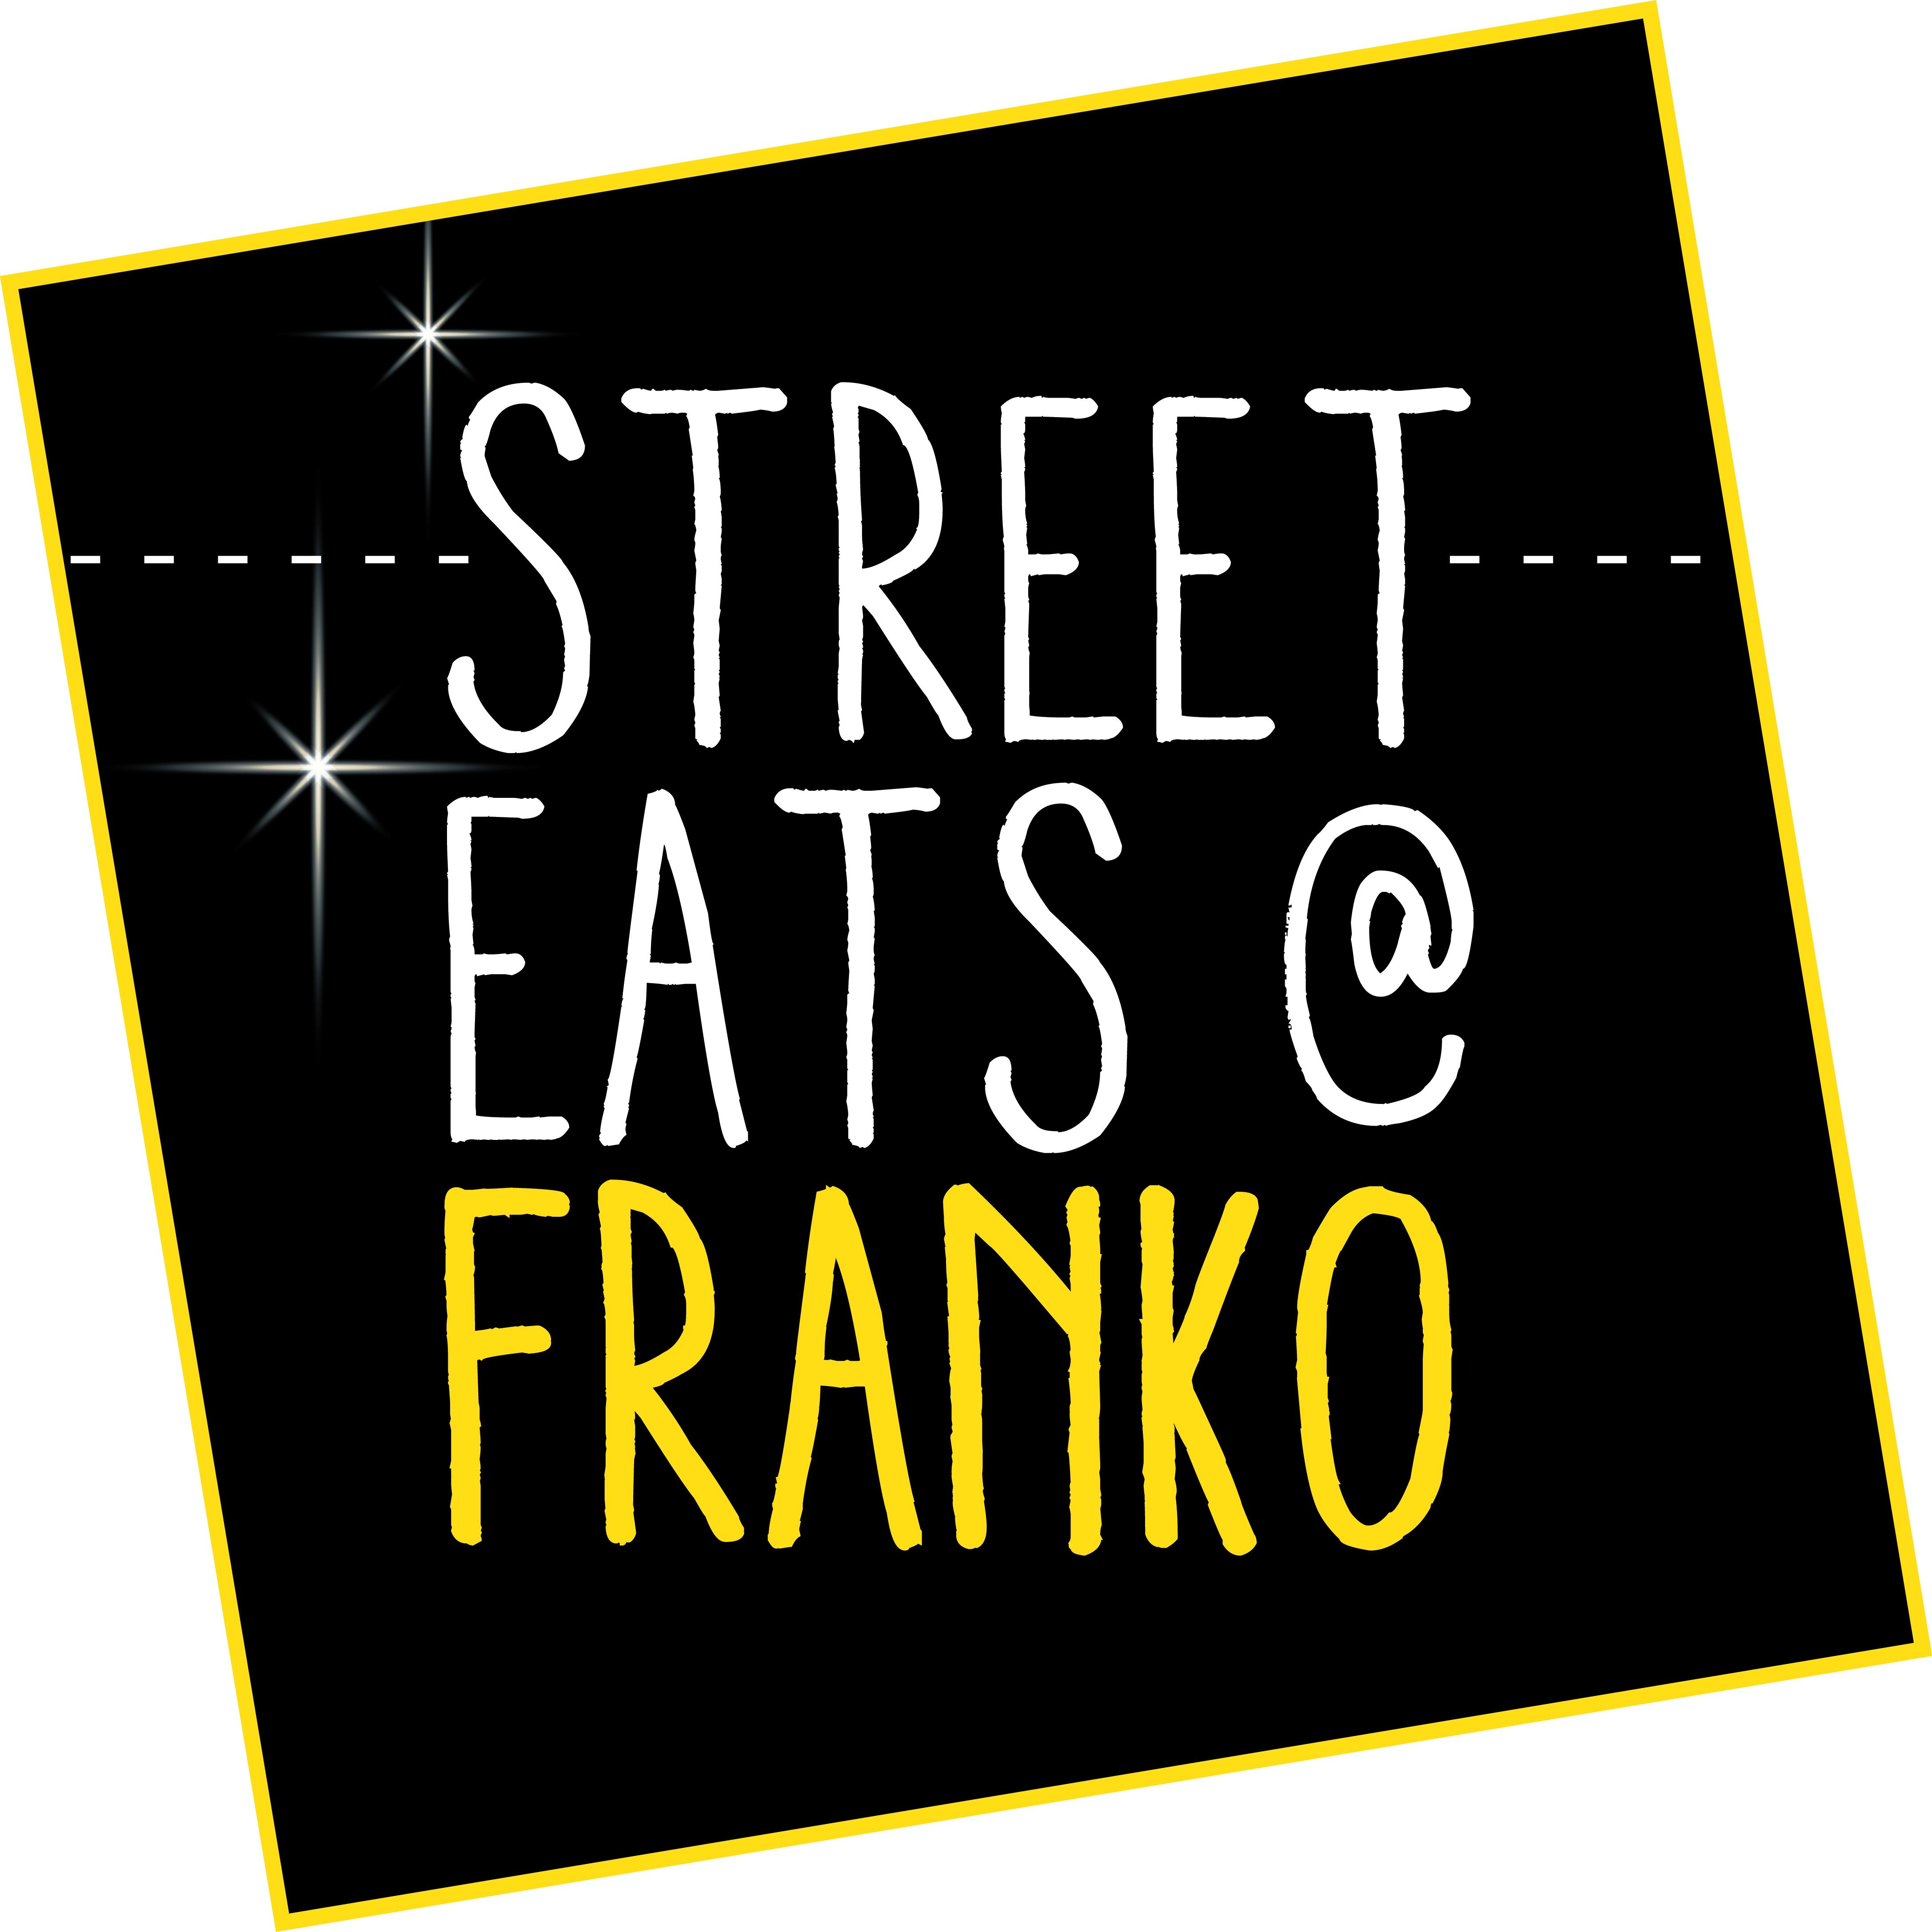 Street Eats Franko